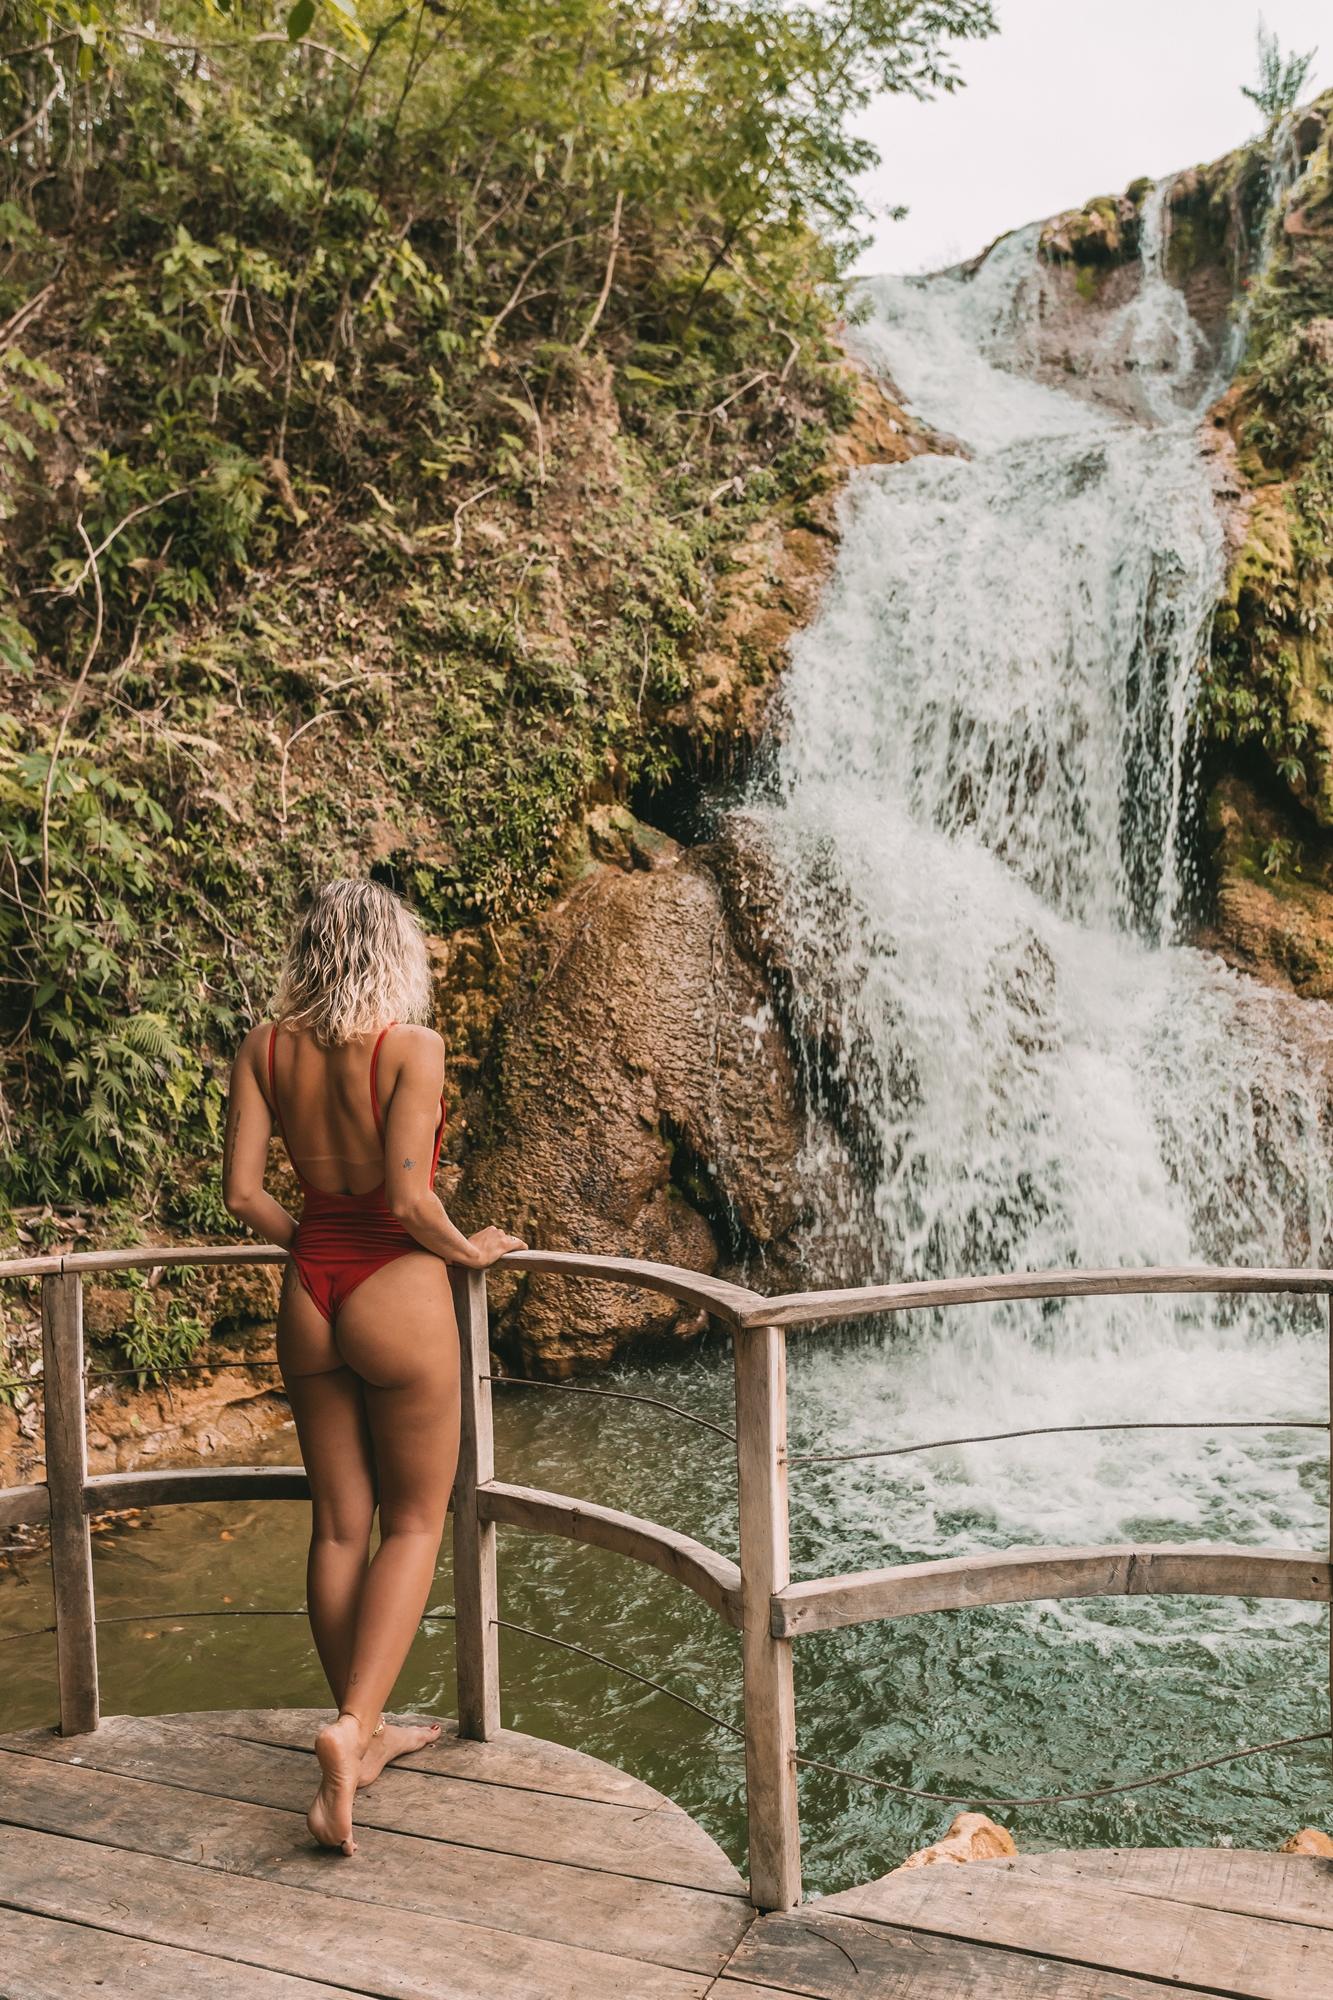 Katyeli_Camargo